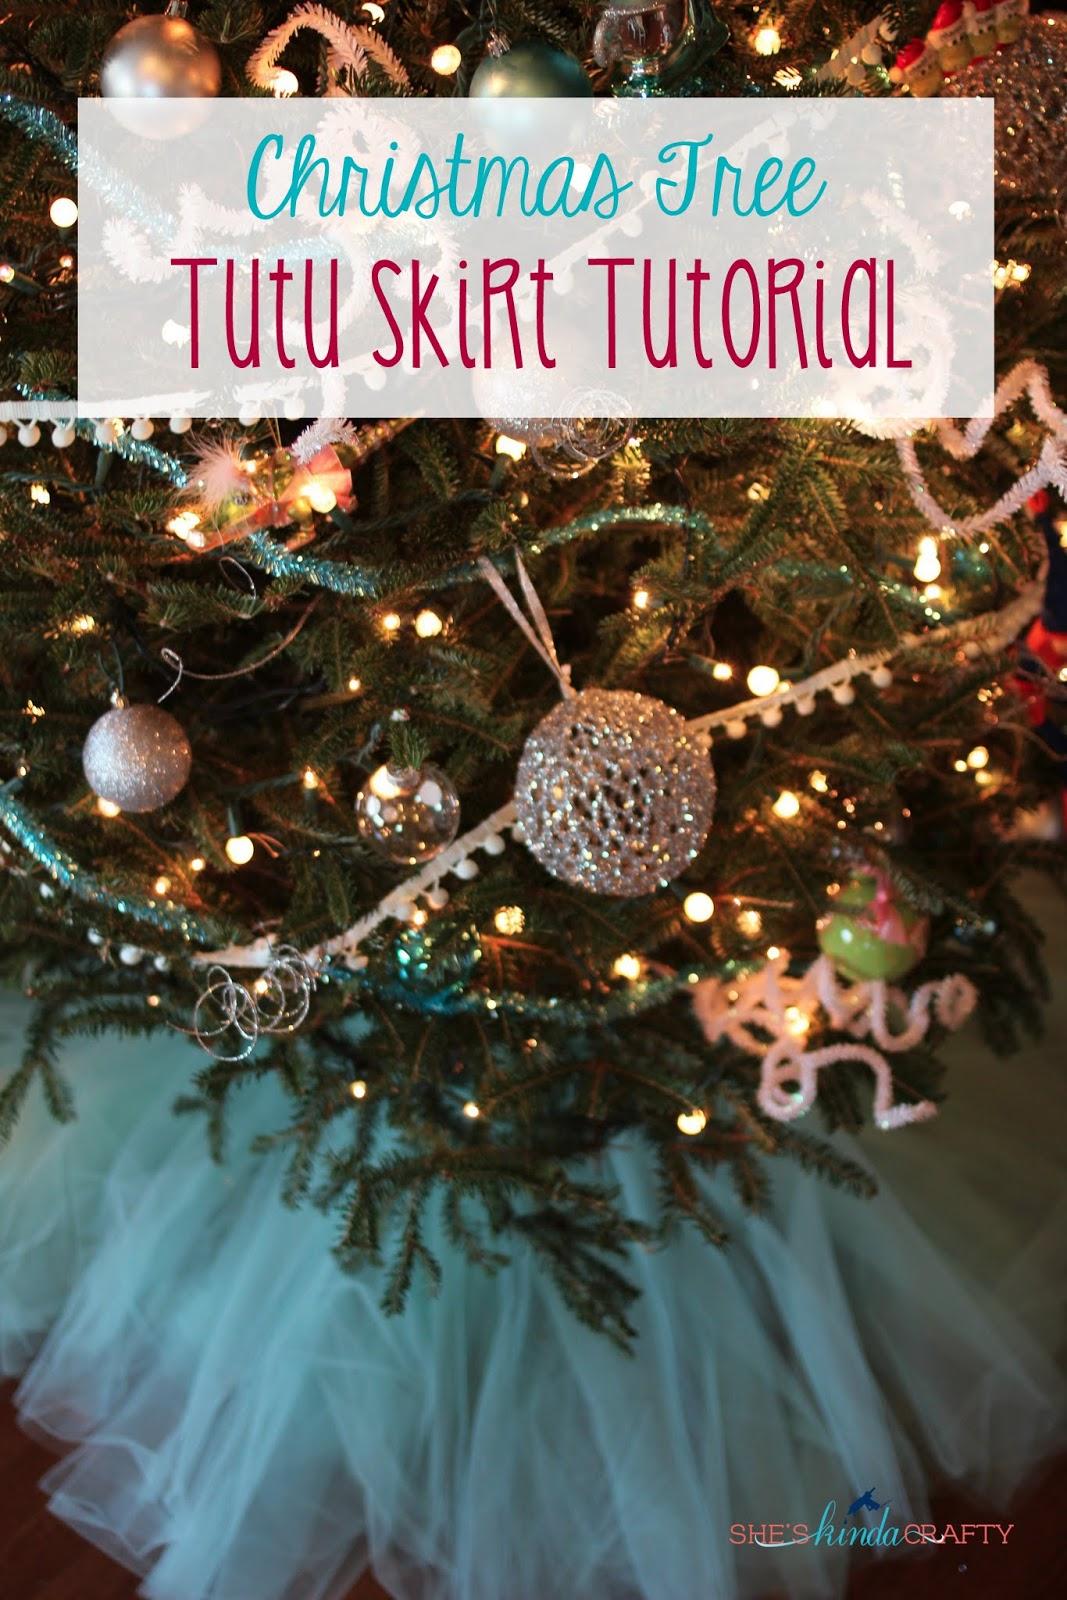 Christmas Tree Tutu Skirt Tutorial - Shes {kinda} Crafty